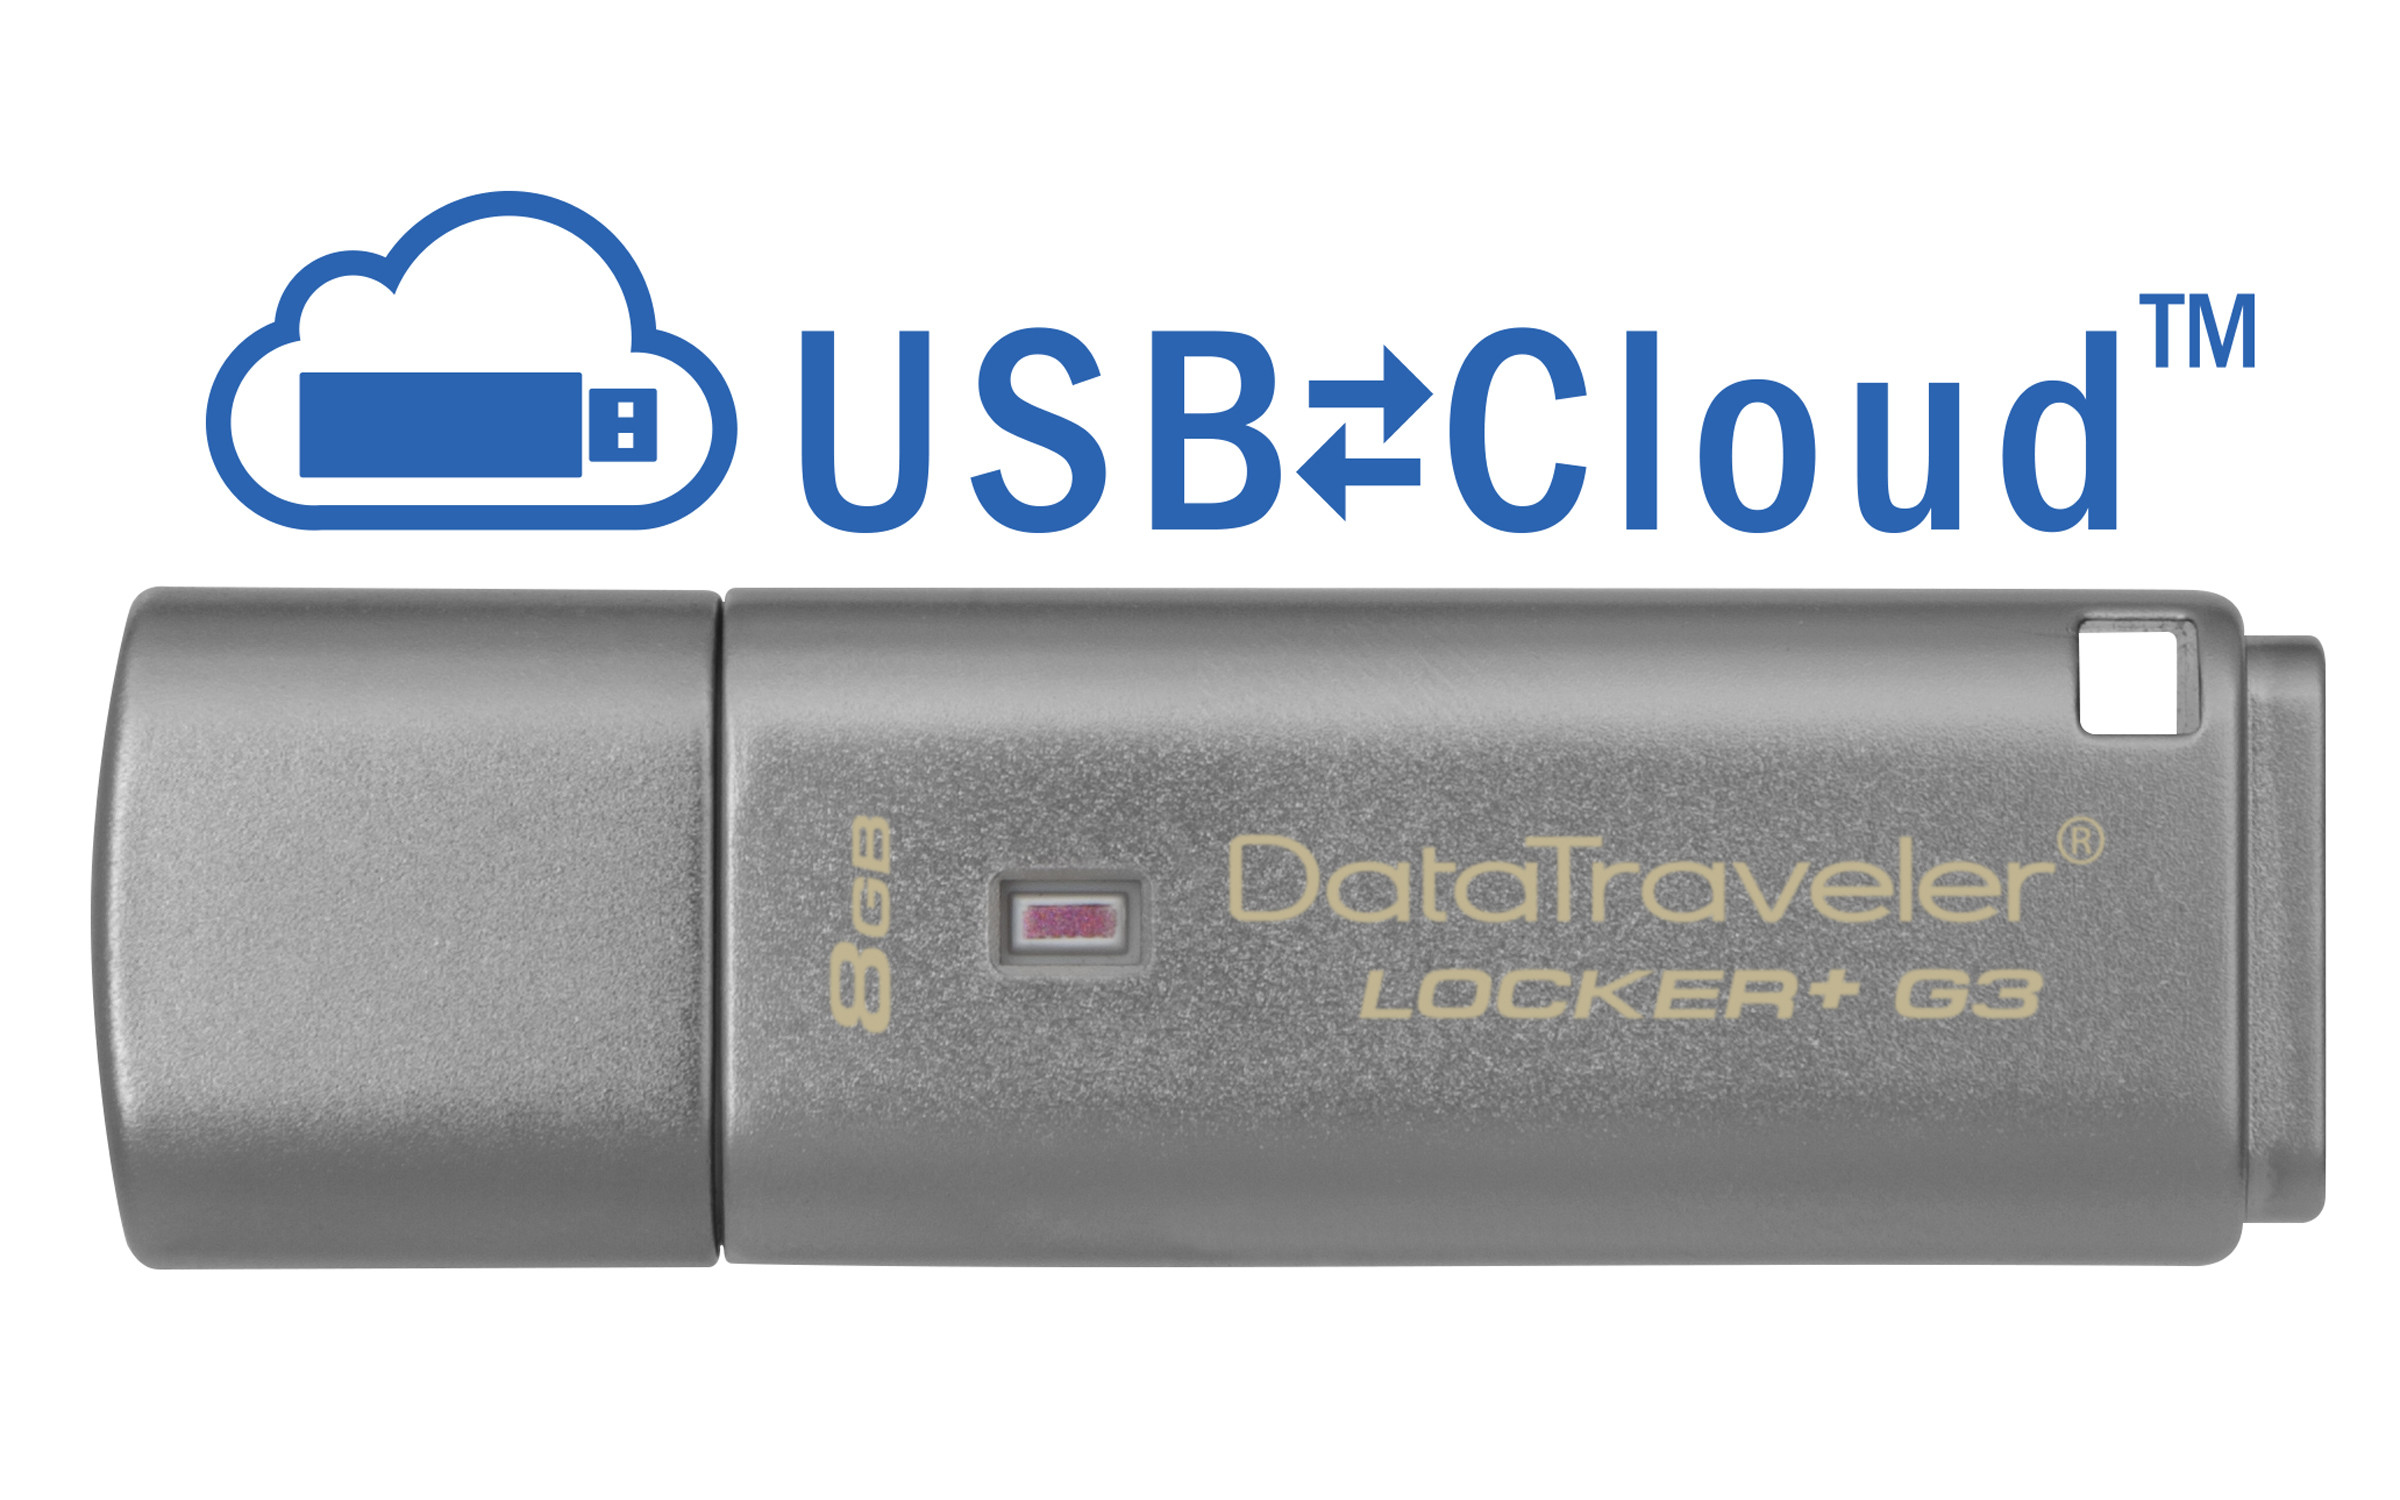 Kingston Technology DataTraveler Locker+ G3 8GB 8GB USB 3.0 Silver USB flash drive DTLPG3/8GB